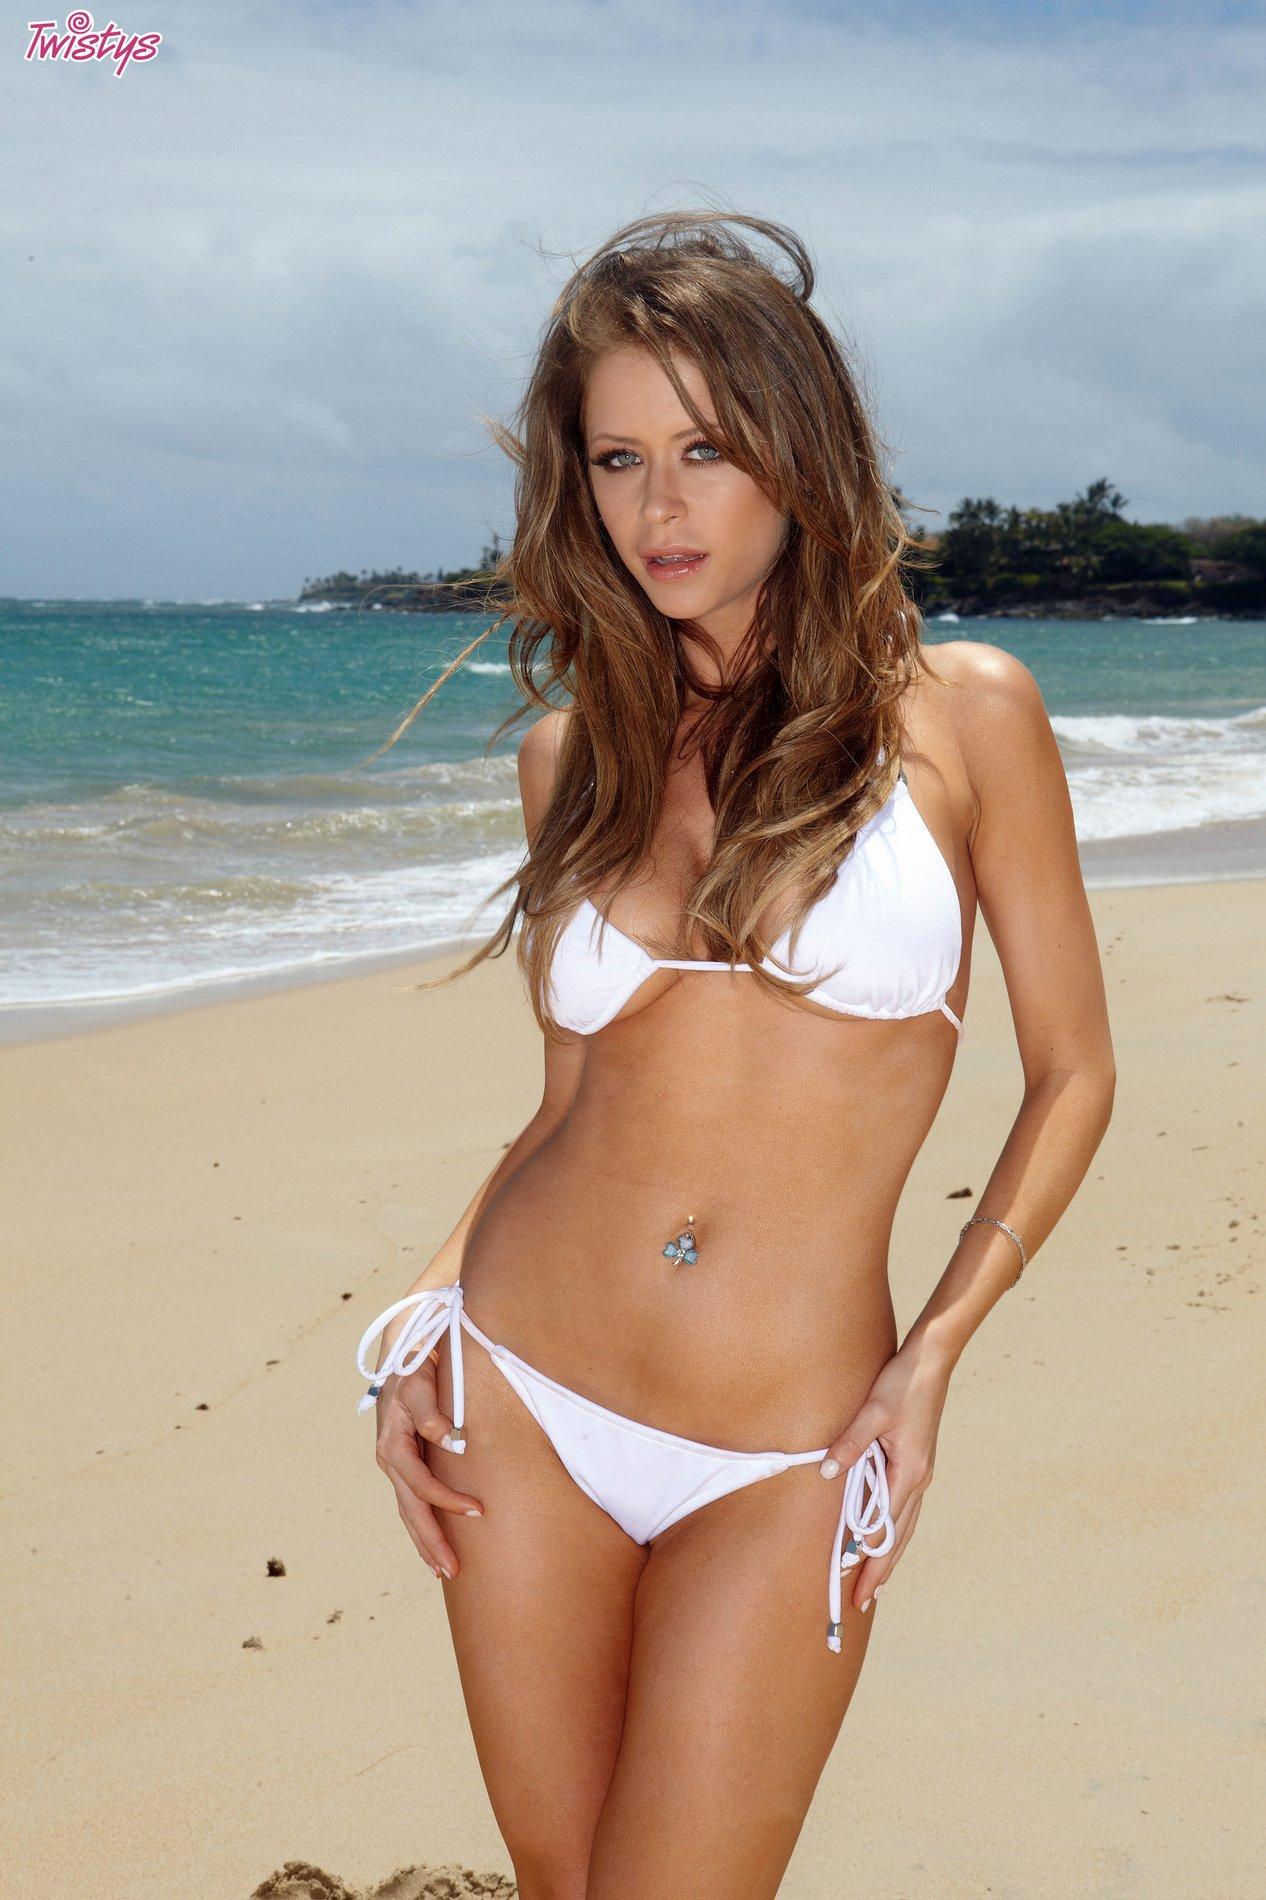 Bikini beauty Emily Addison poses on the beach - My ...